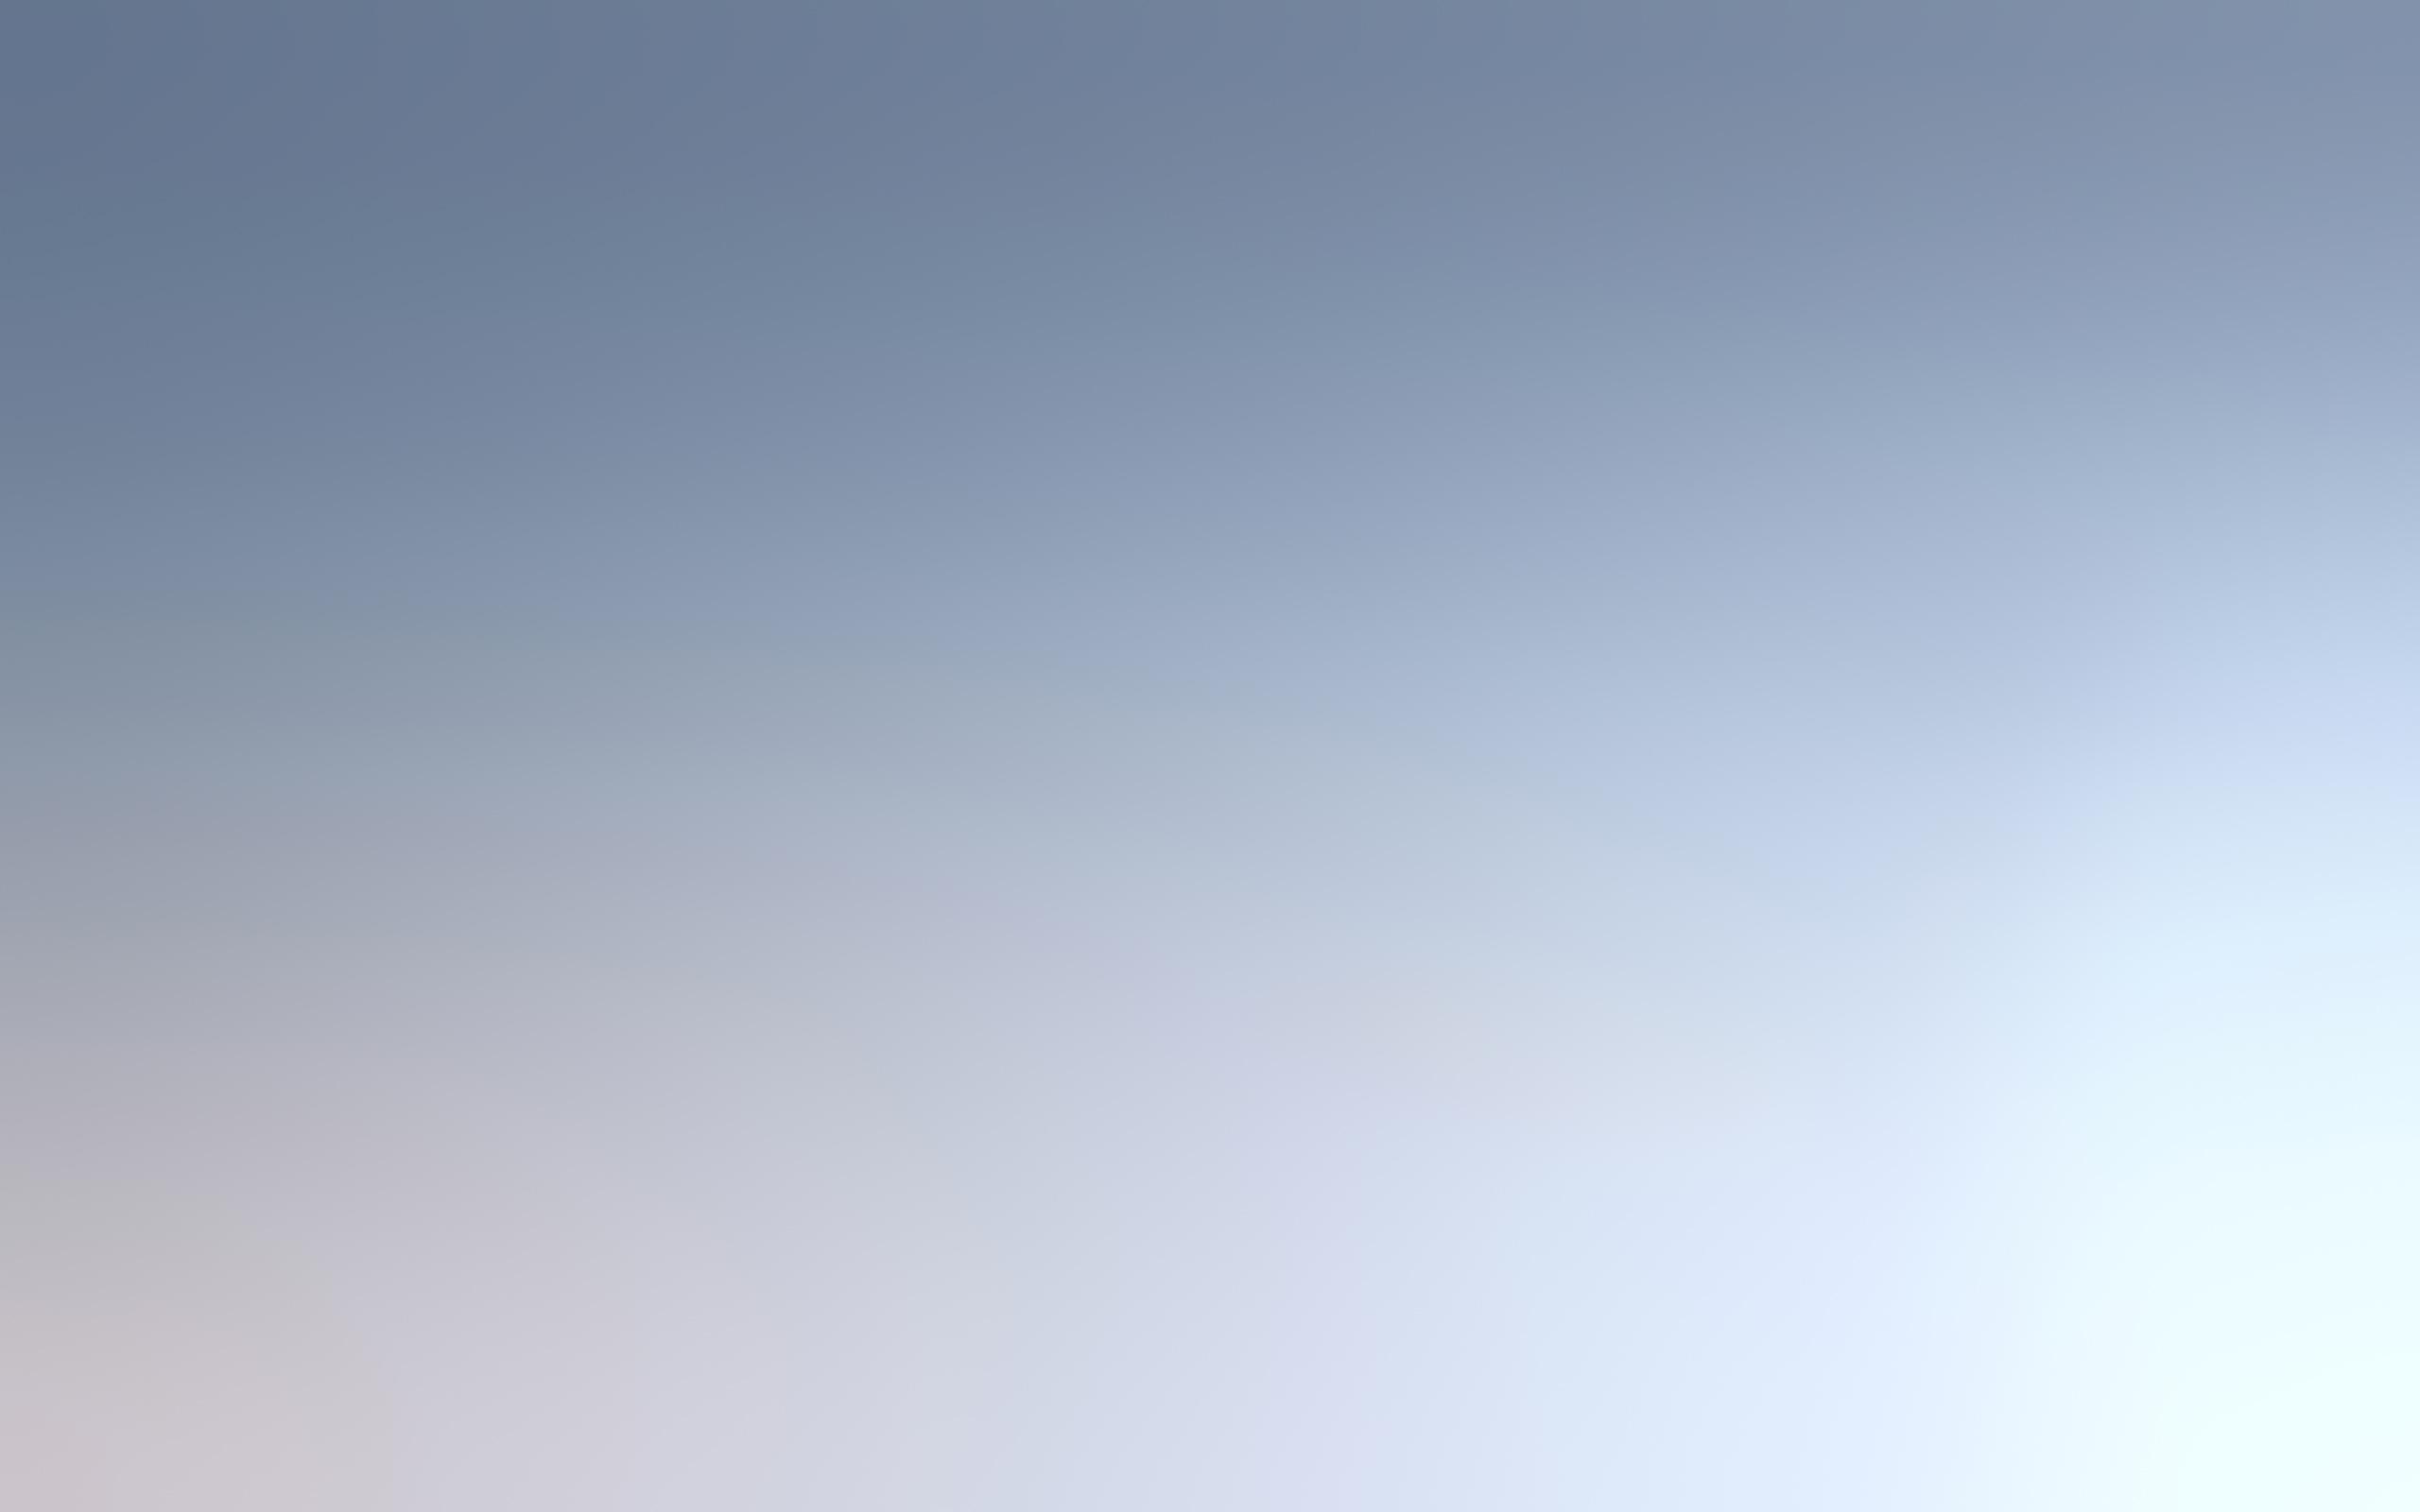 Brown Wallpaper Iphone X Gradient By Adam Dorman Digital Artist